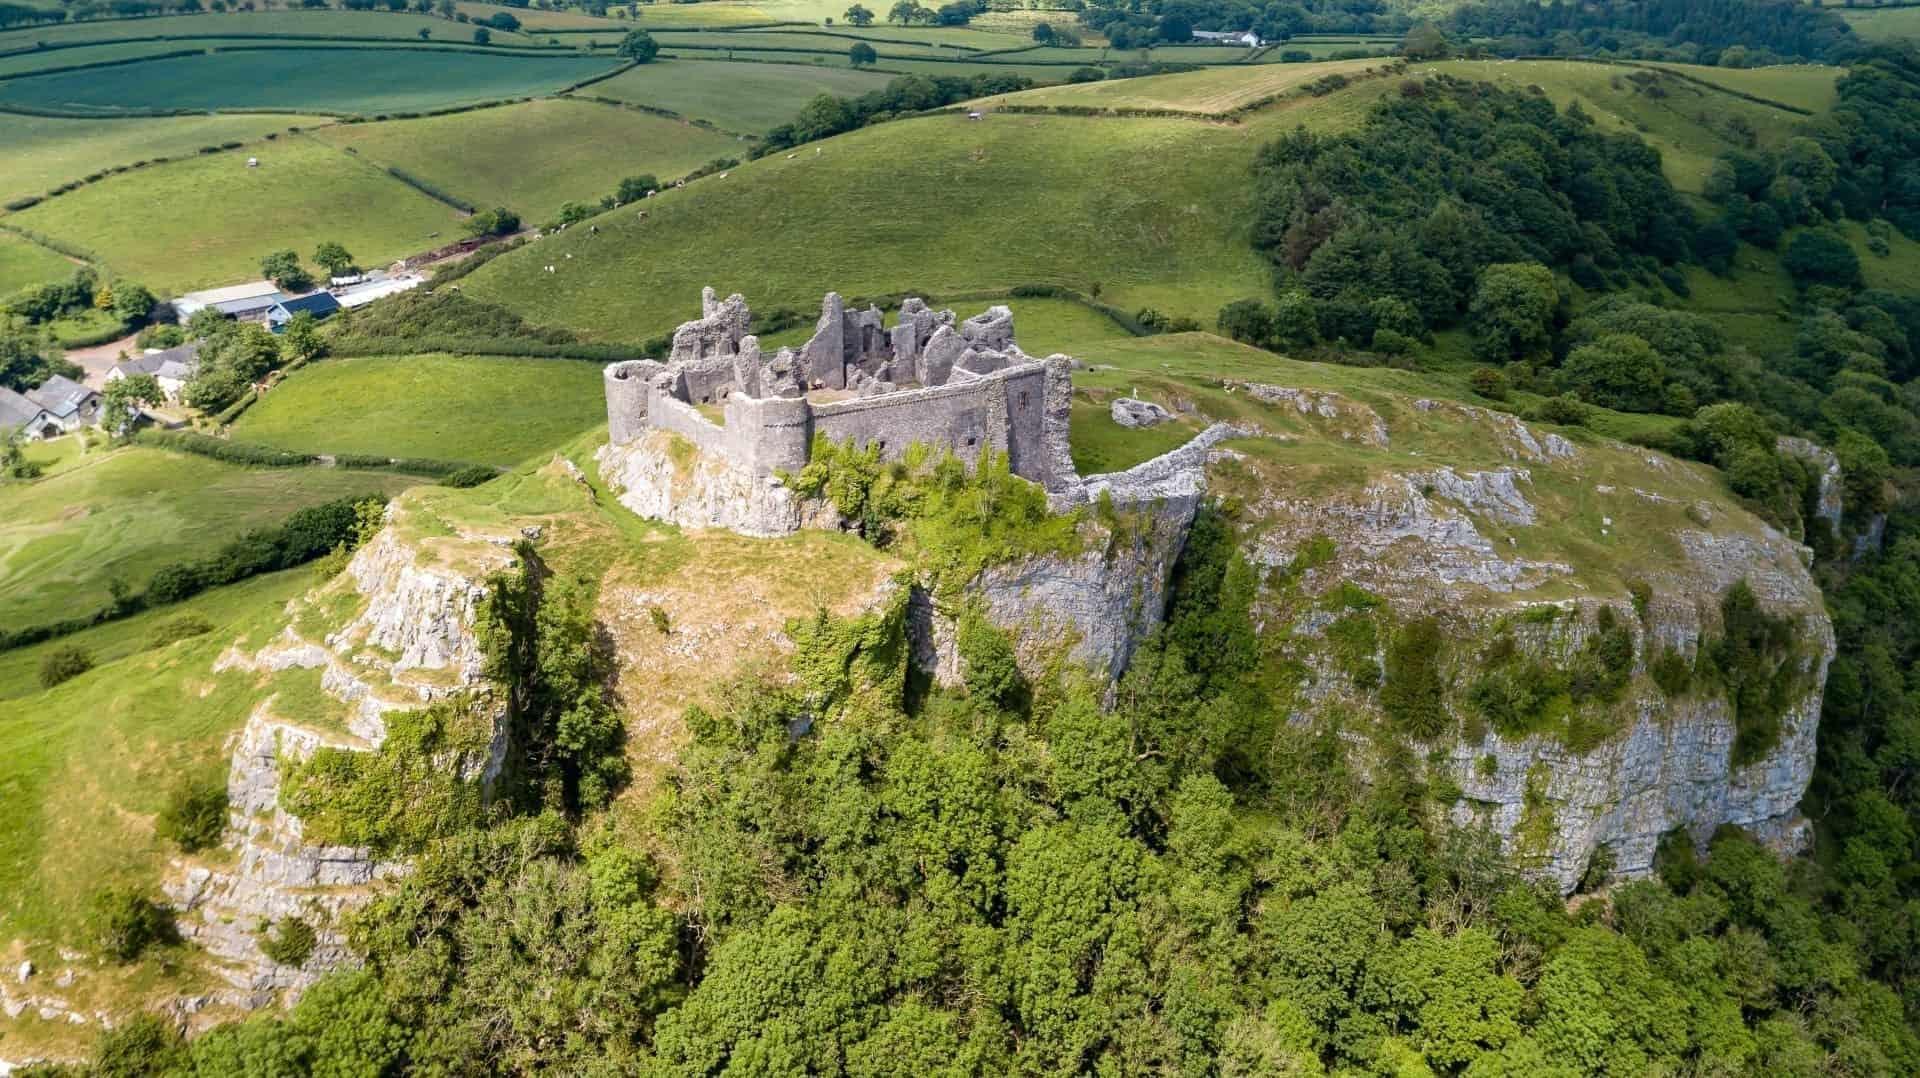 Fun things to do in the Brecon Beacons - Carreg Cennen Castle